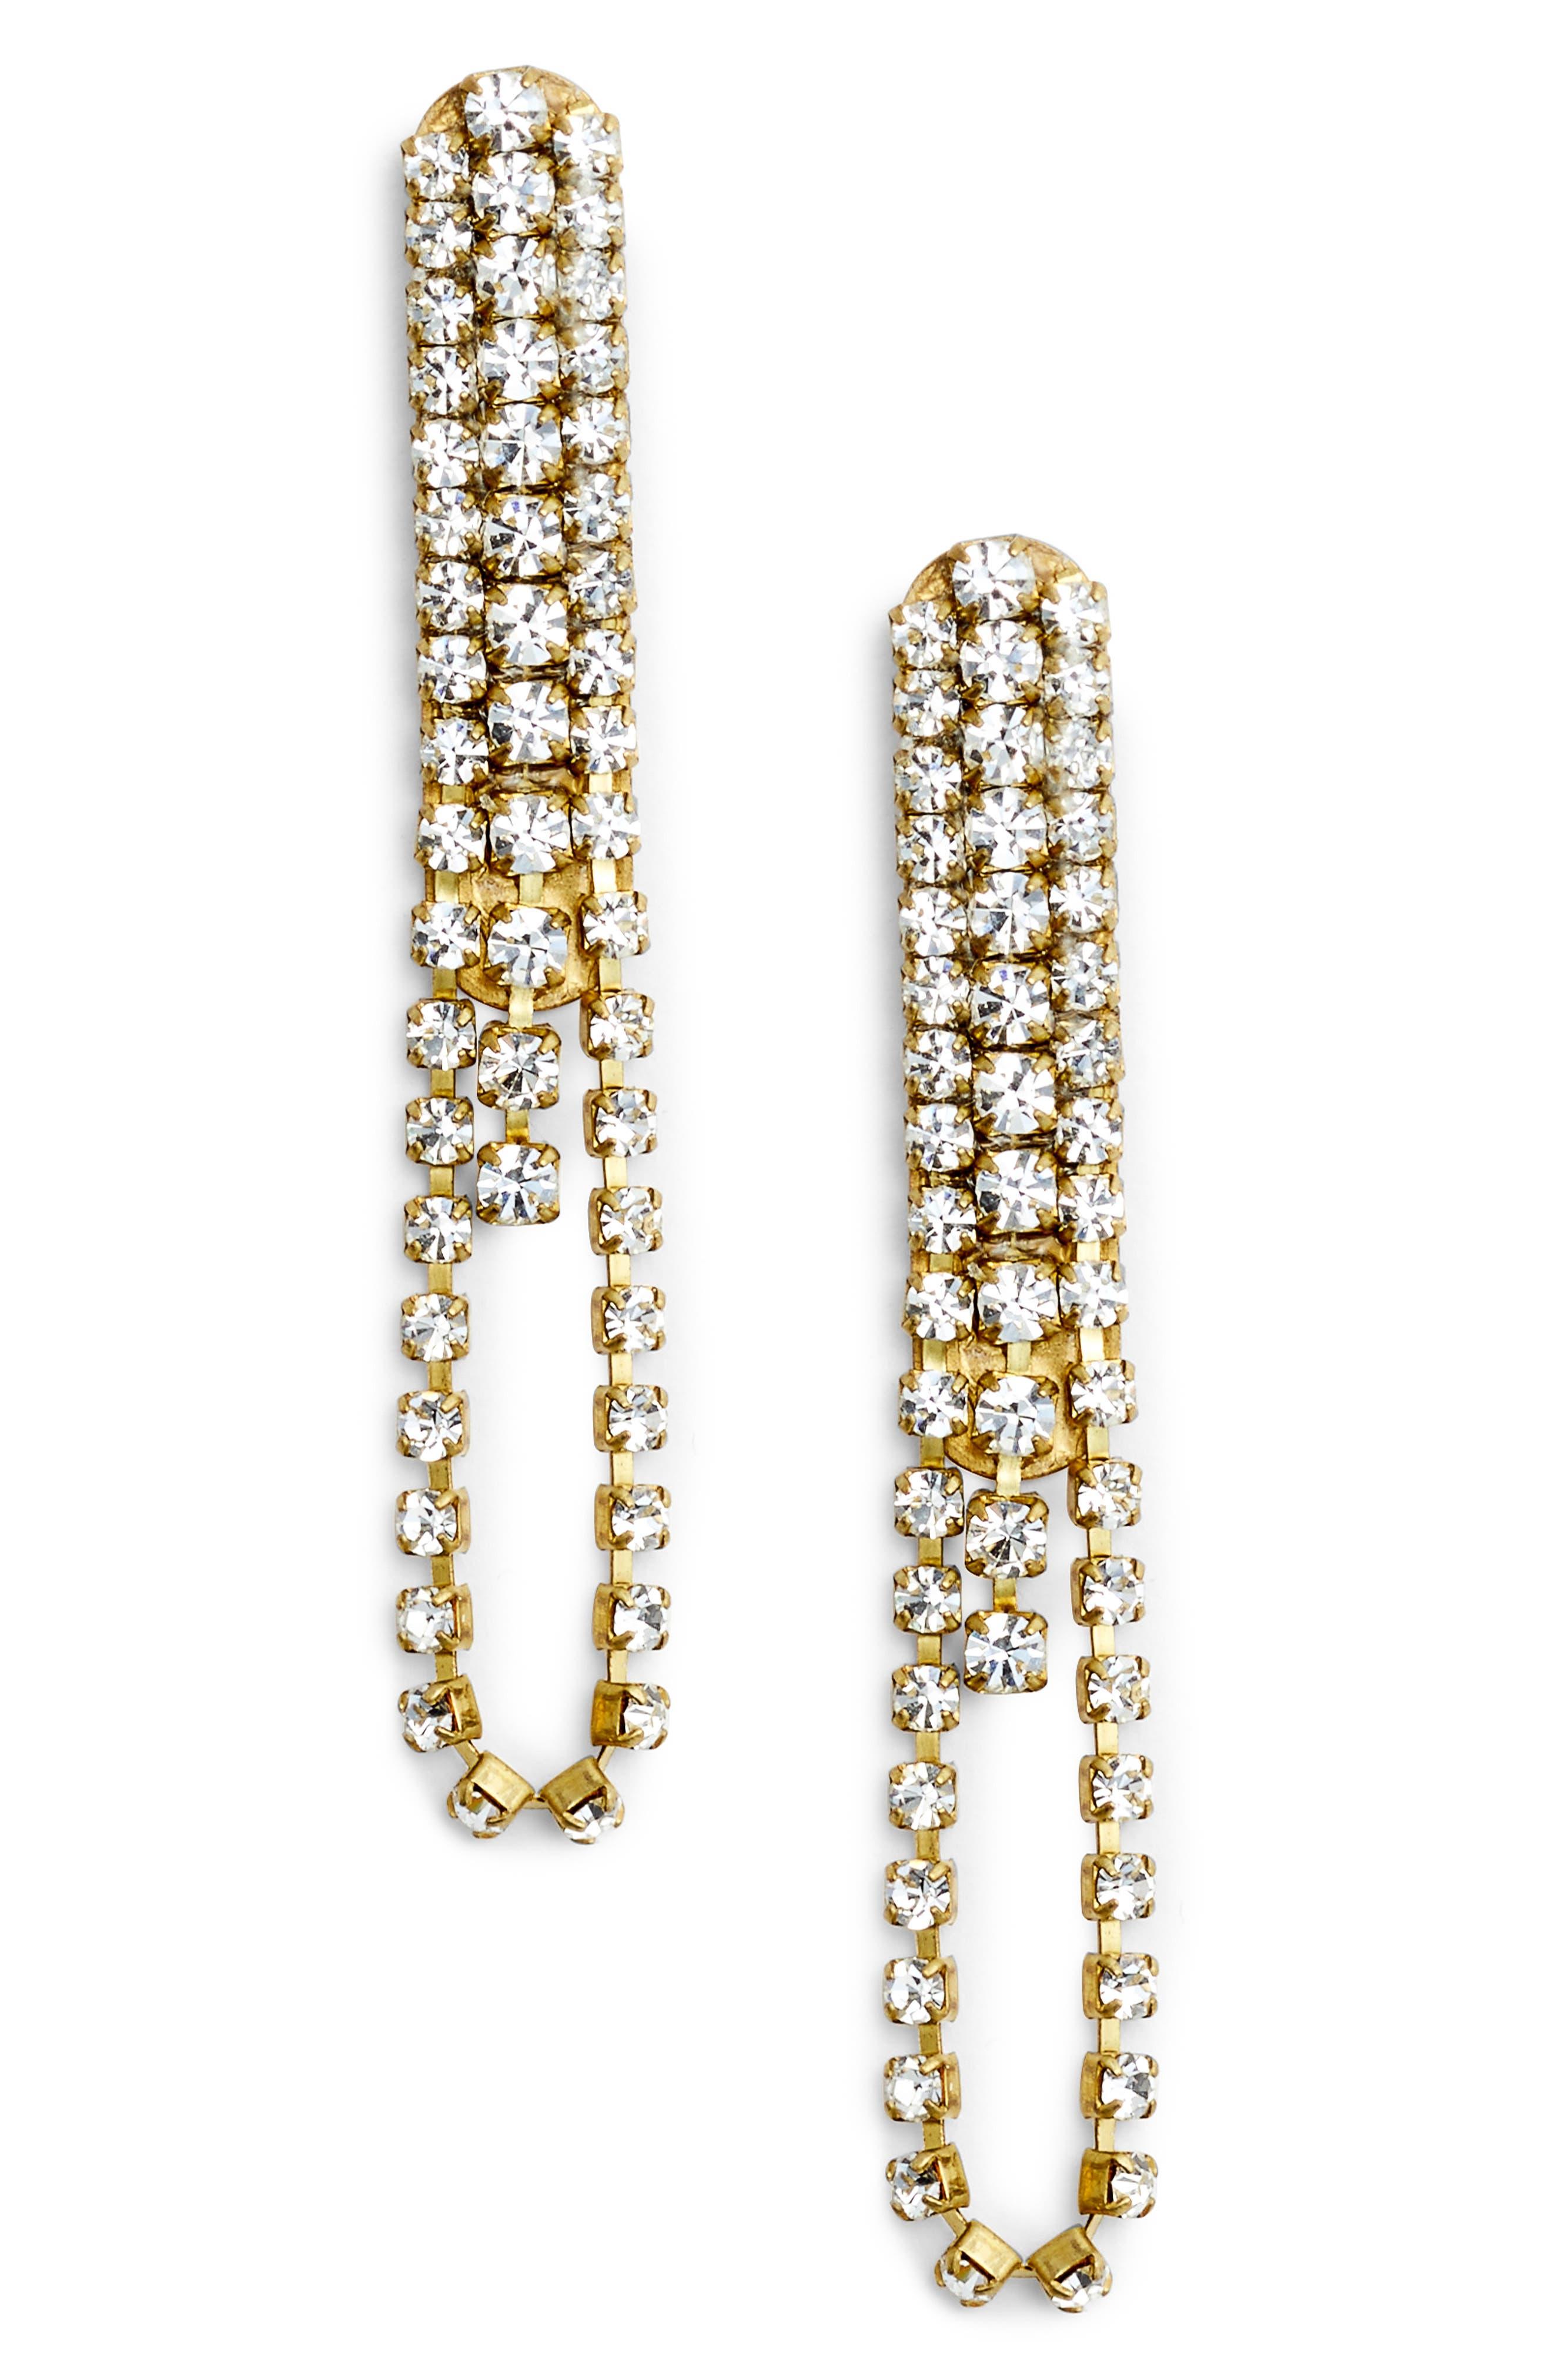 Drape Earrings,                         Main,                         color, Gold/ Crystal